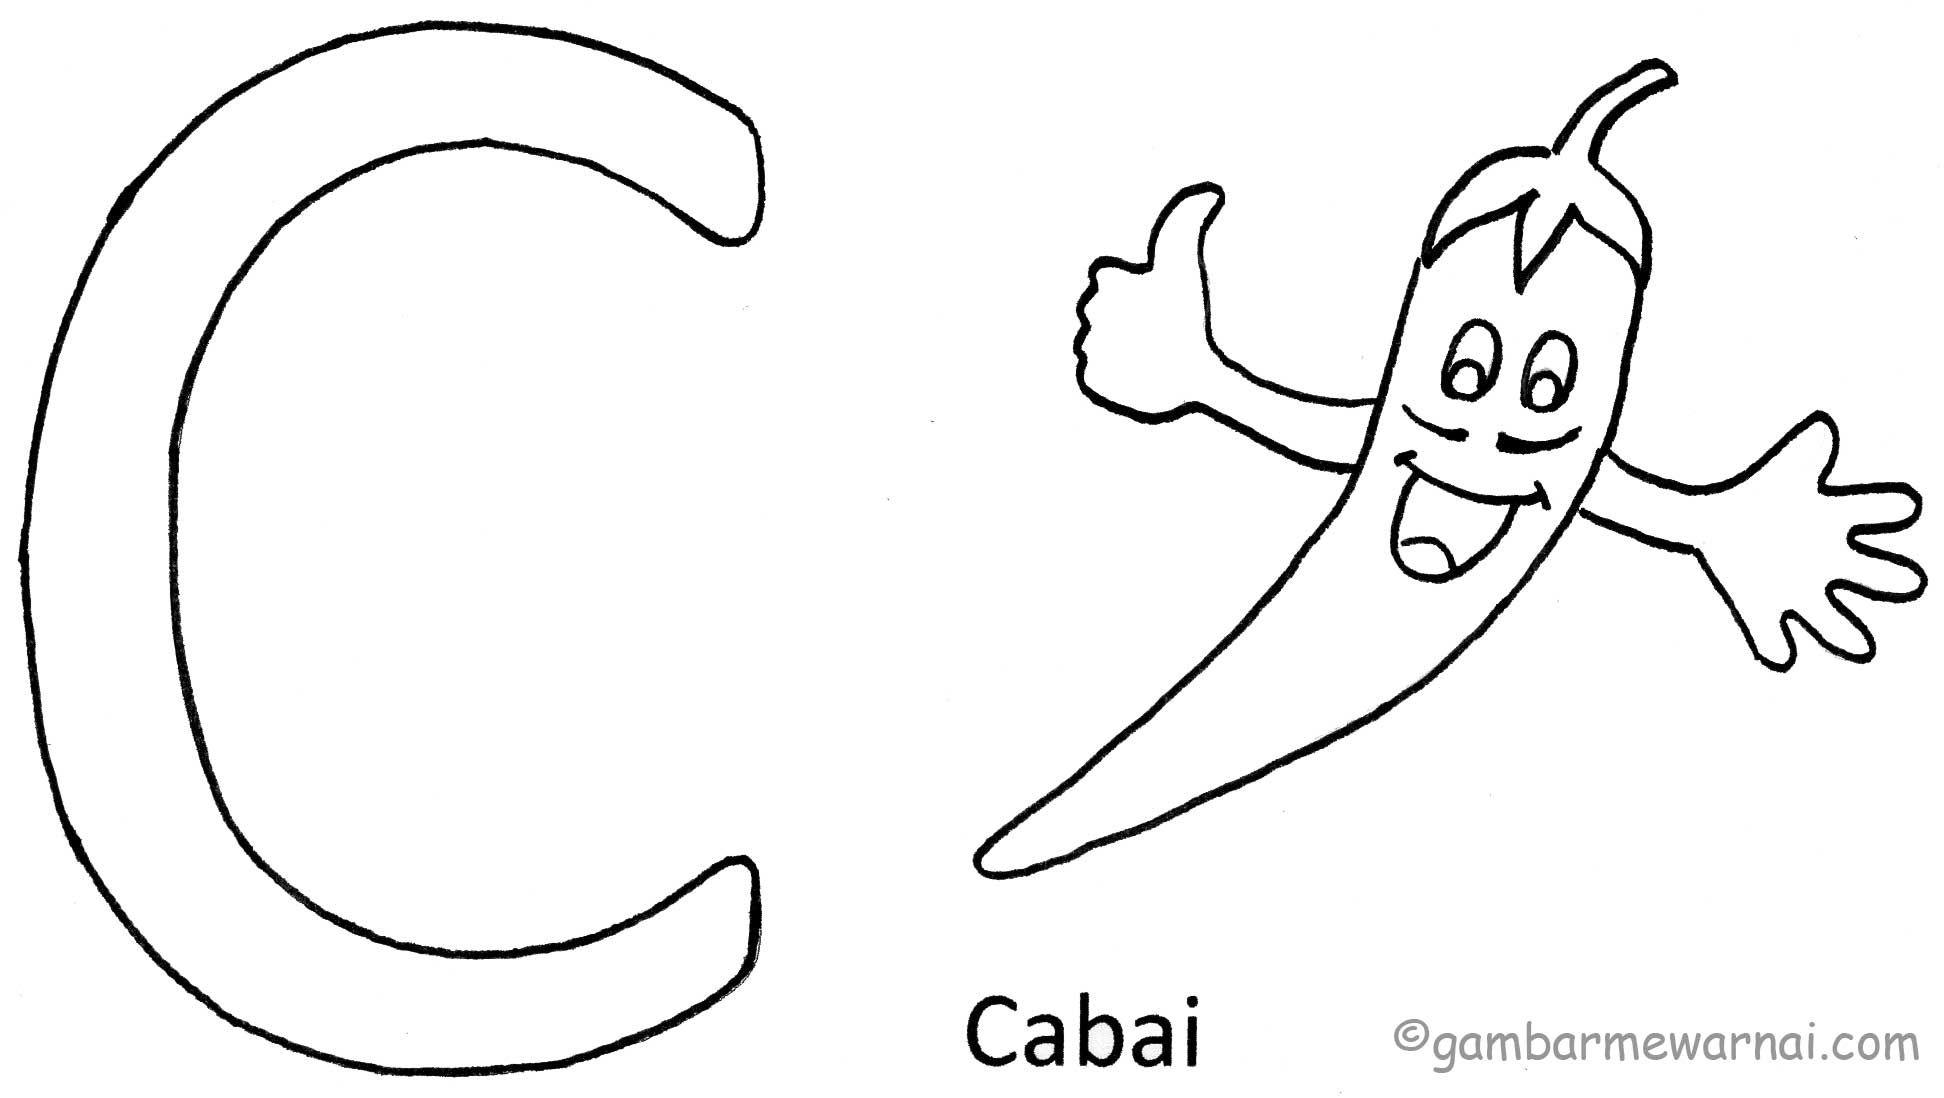 Belajar Mewarnai Huruf C Dengan Gambar Huruf Belajar Warna